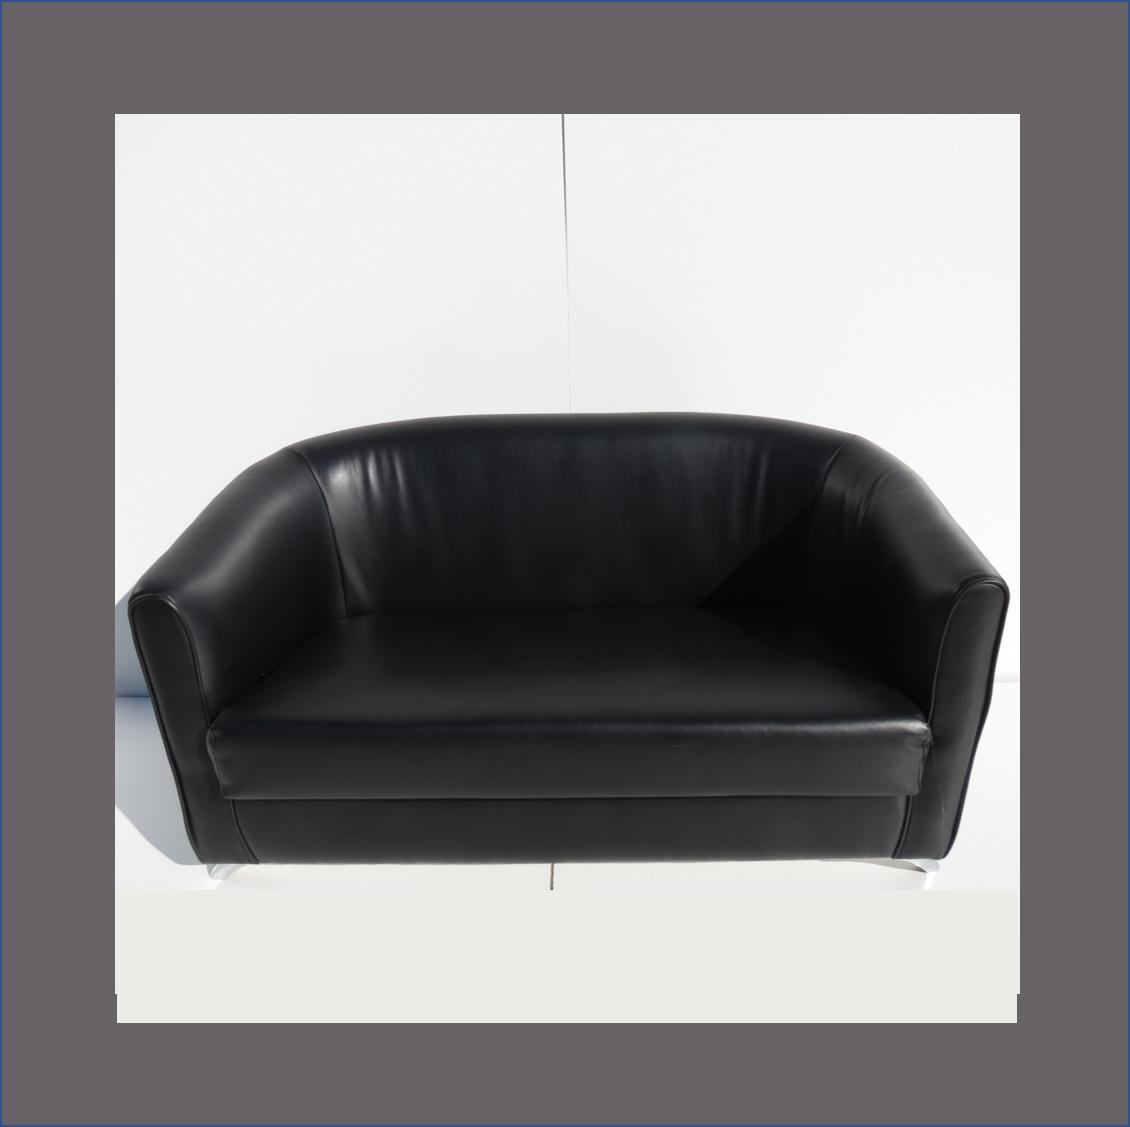 2-seater-tub-sofa-black